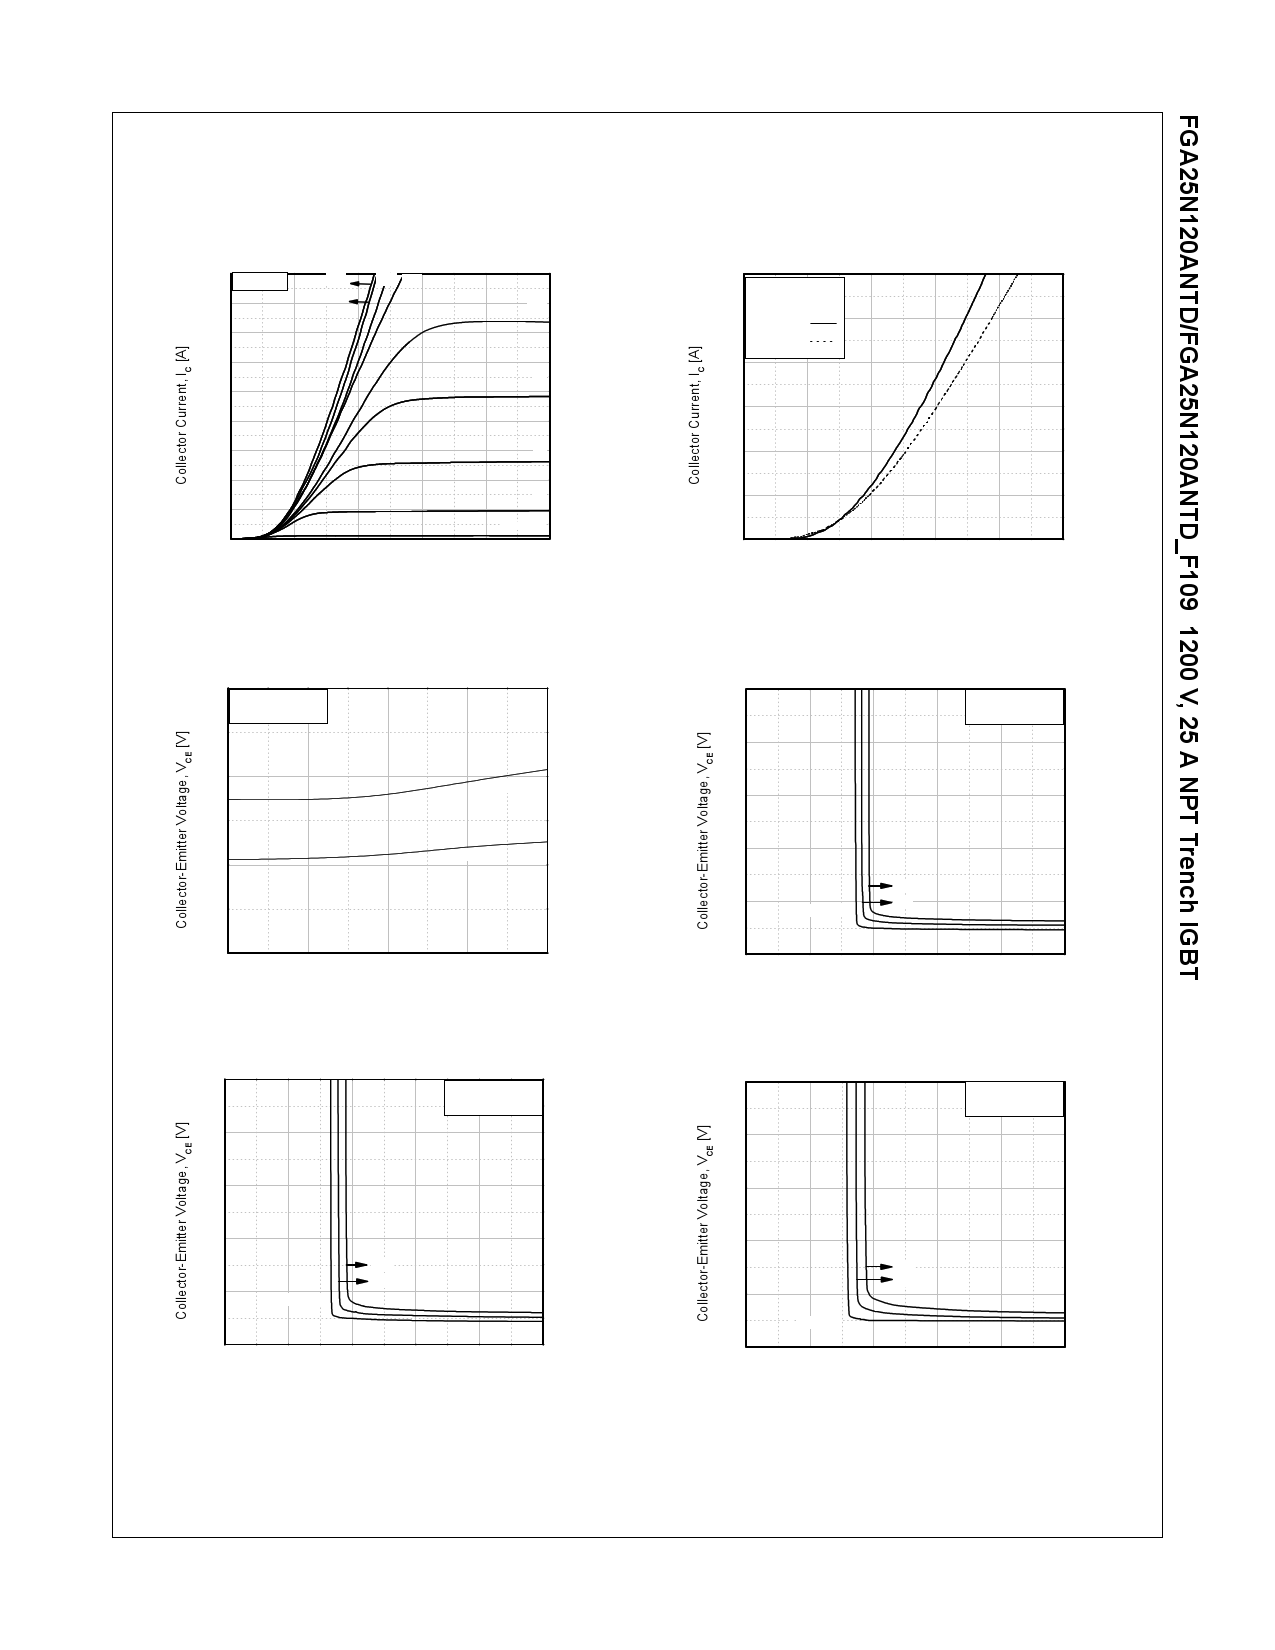 FGA25N120ANTD_F109 pdf, 반도체, 판매, 대치품